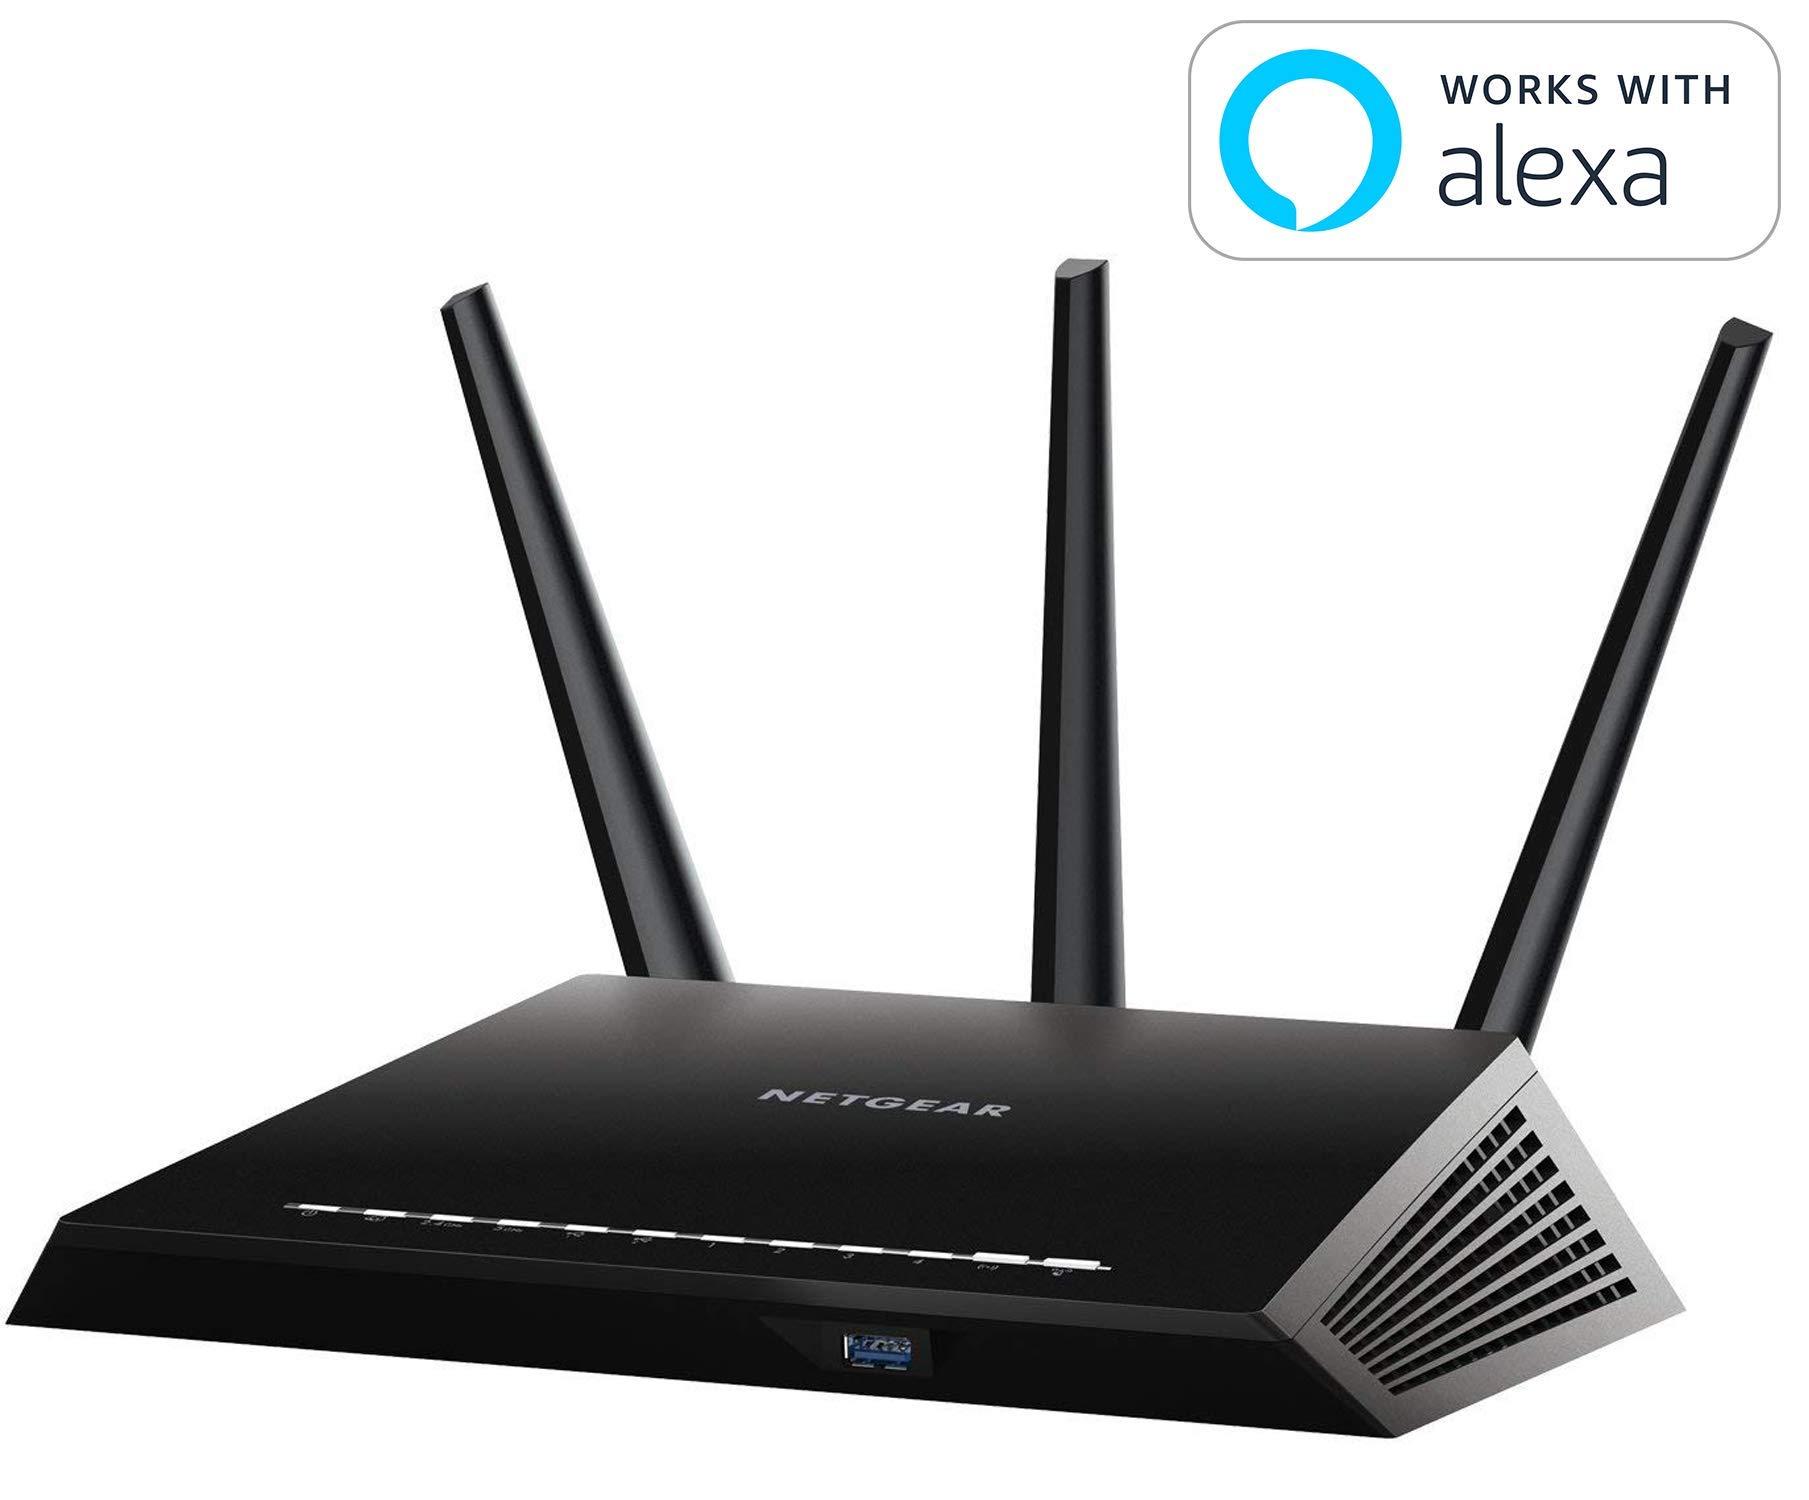 NETGEAR Nighthawk AC1900 Smart WiFi Router - Dual Band Gigabit (R6900-100NAS) by NETGEAR